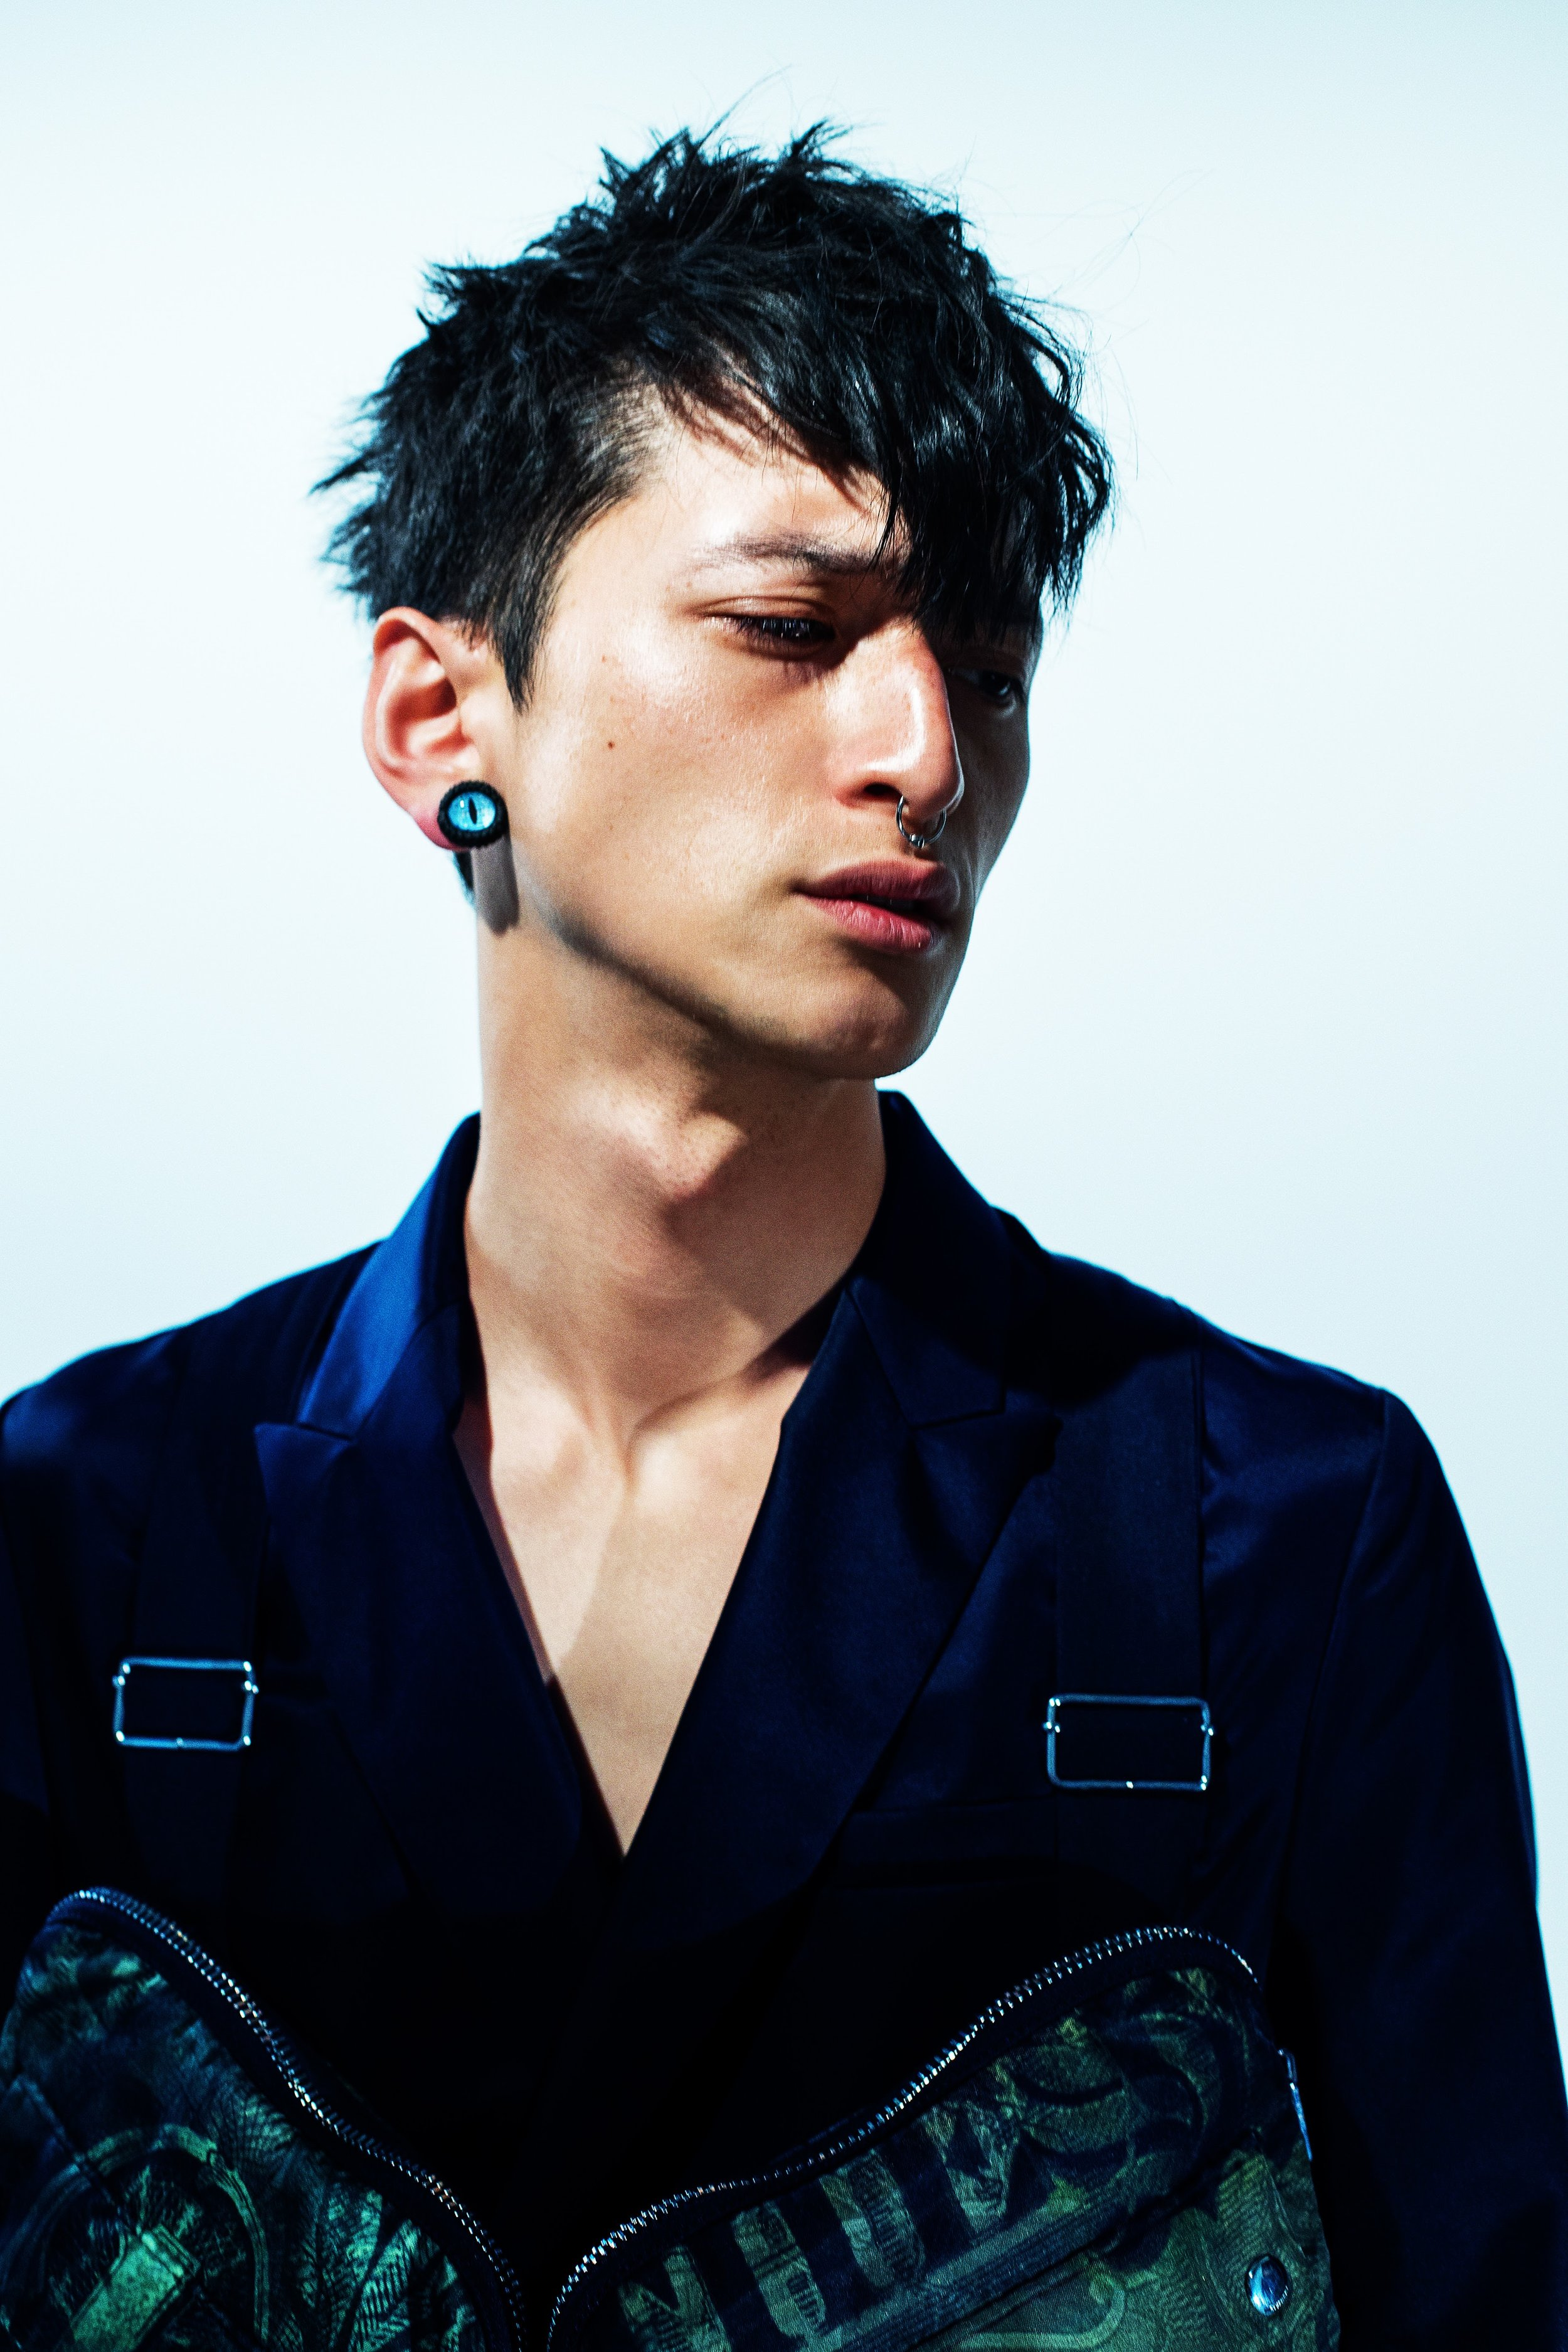 Givenchy3195.jpg